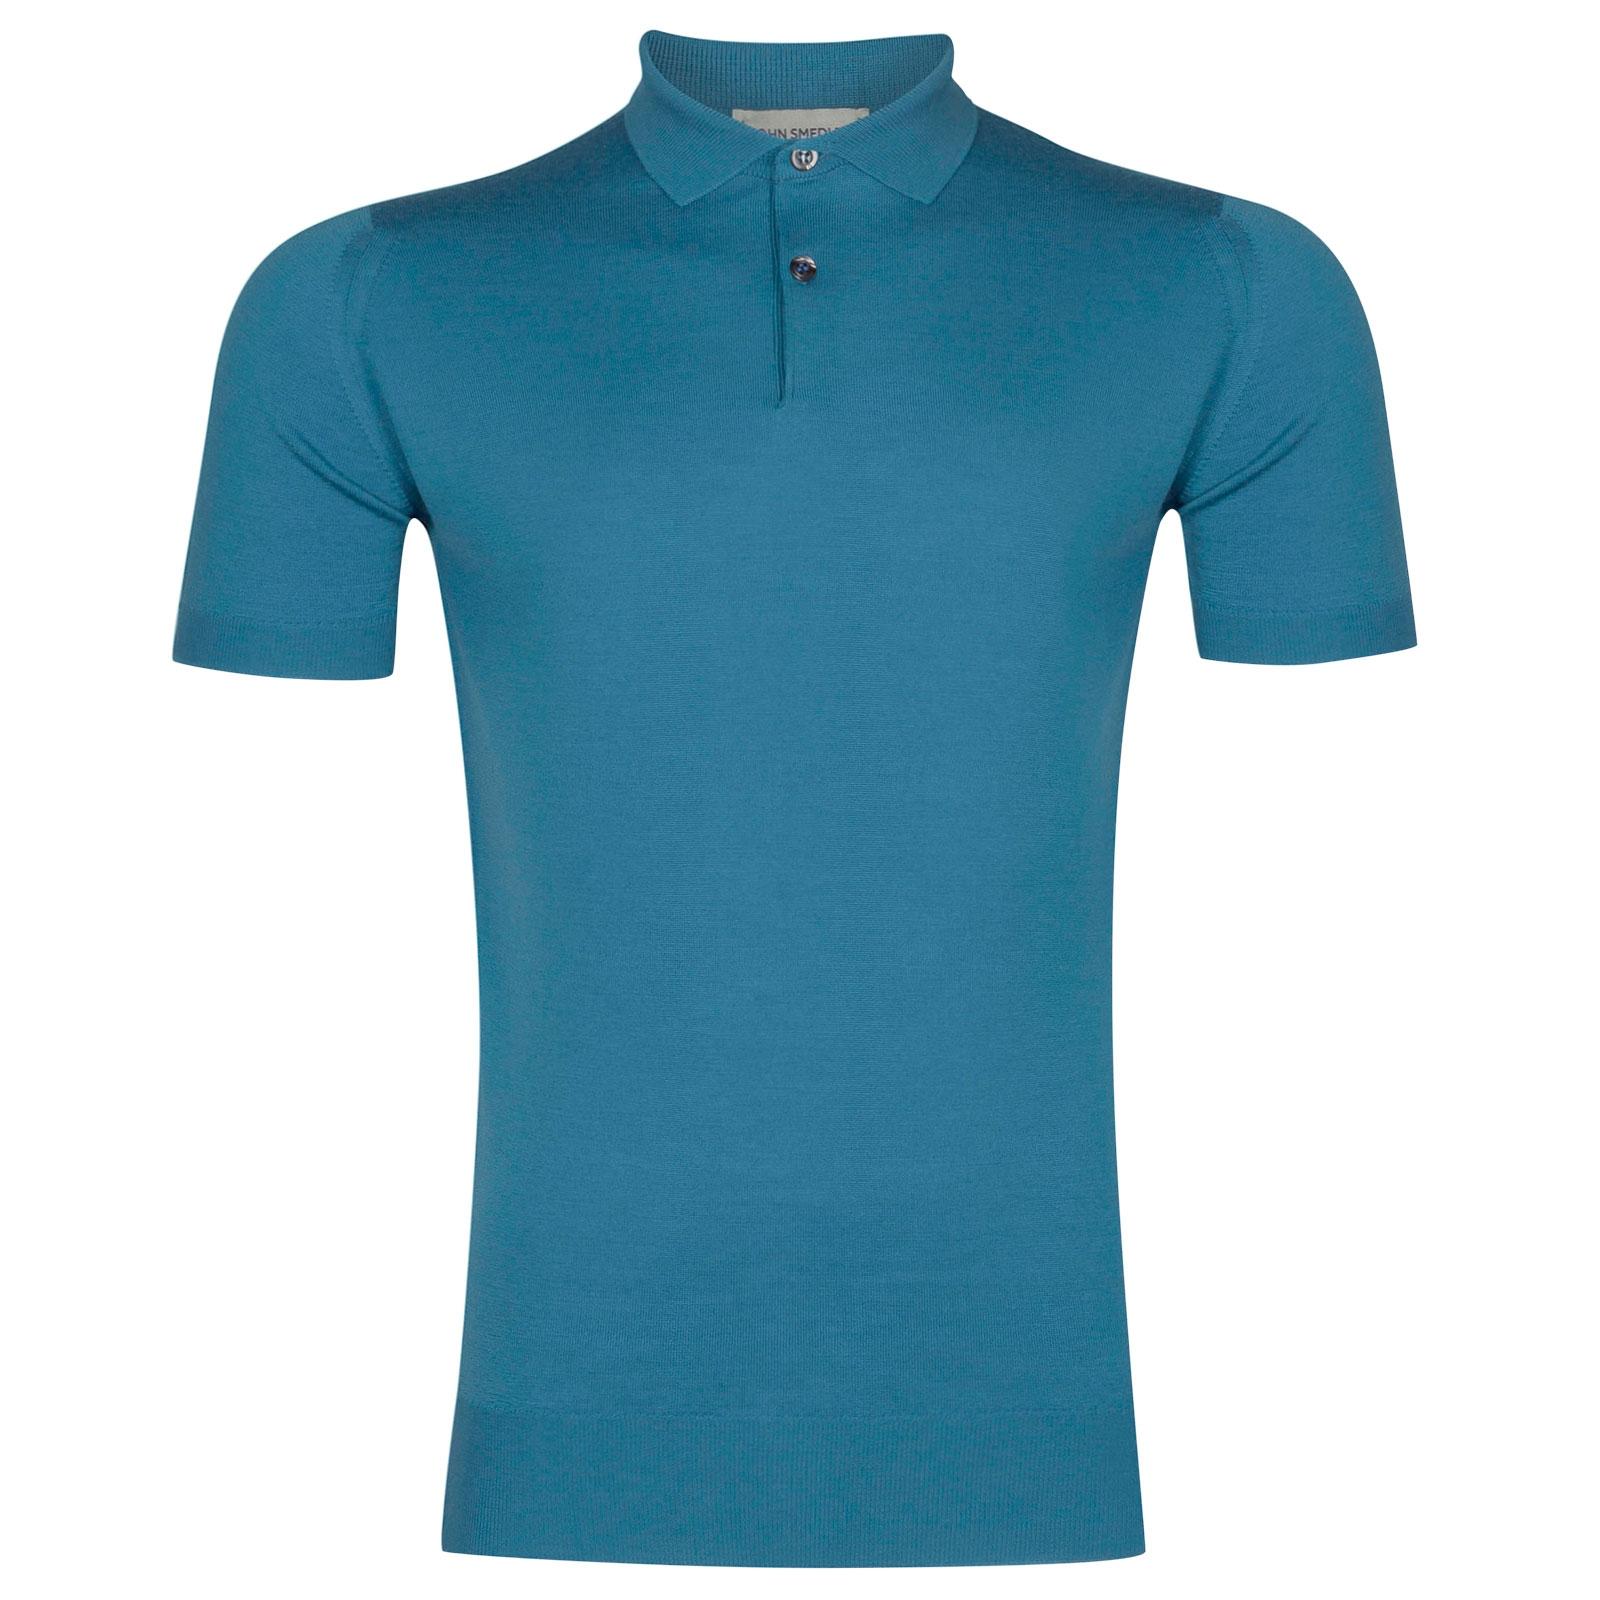 John Smedley Payton Merino Wool Shirt in Ionize Blue-M